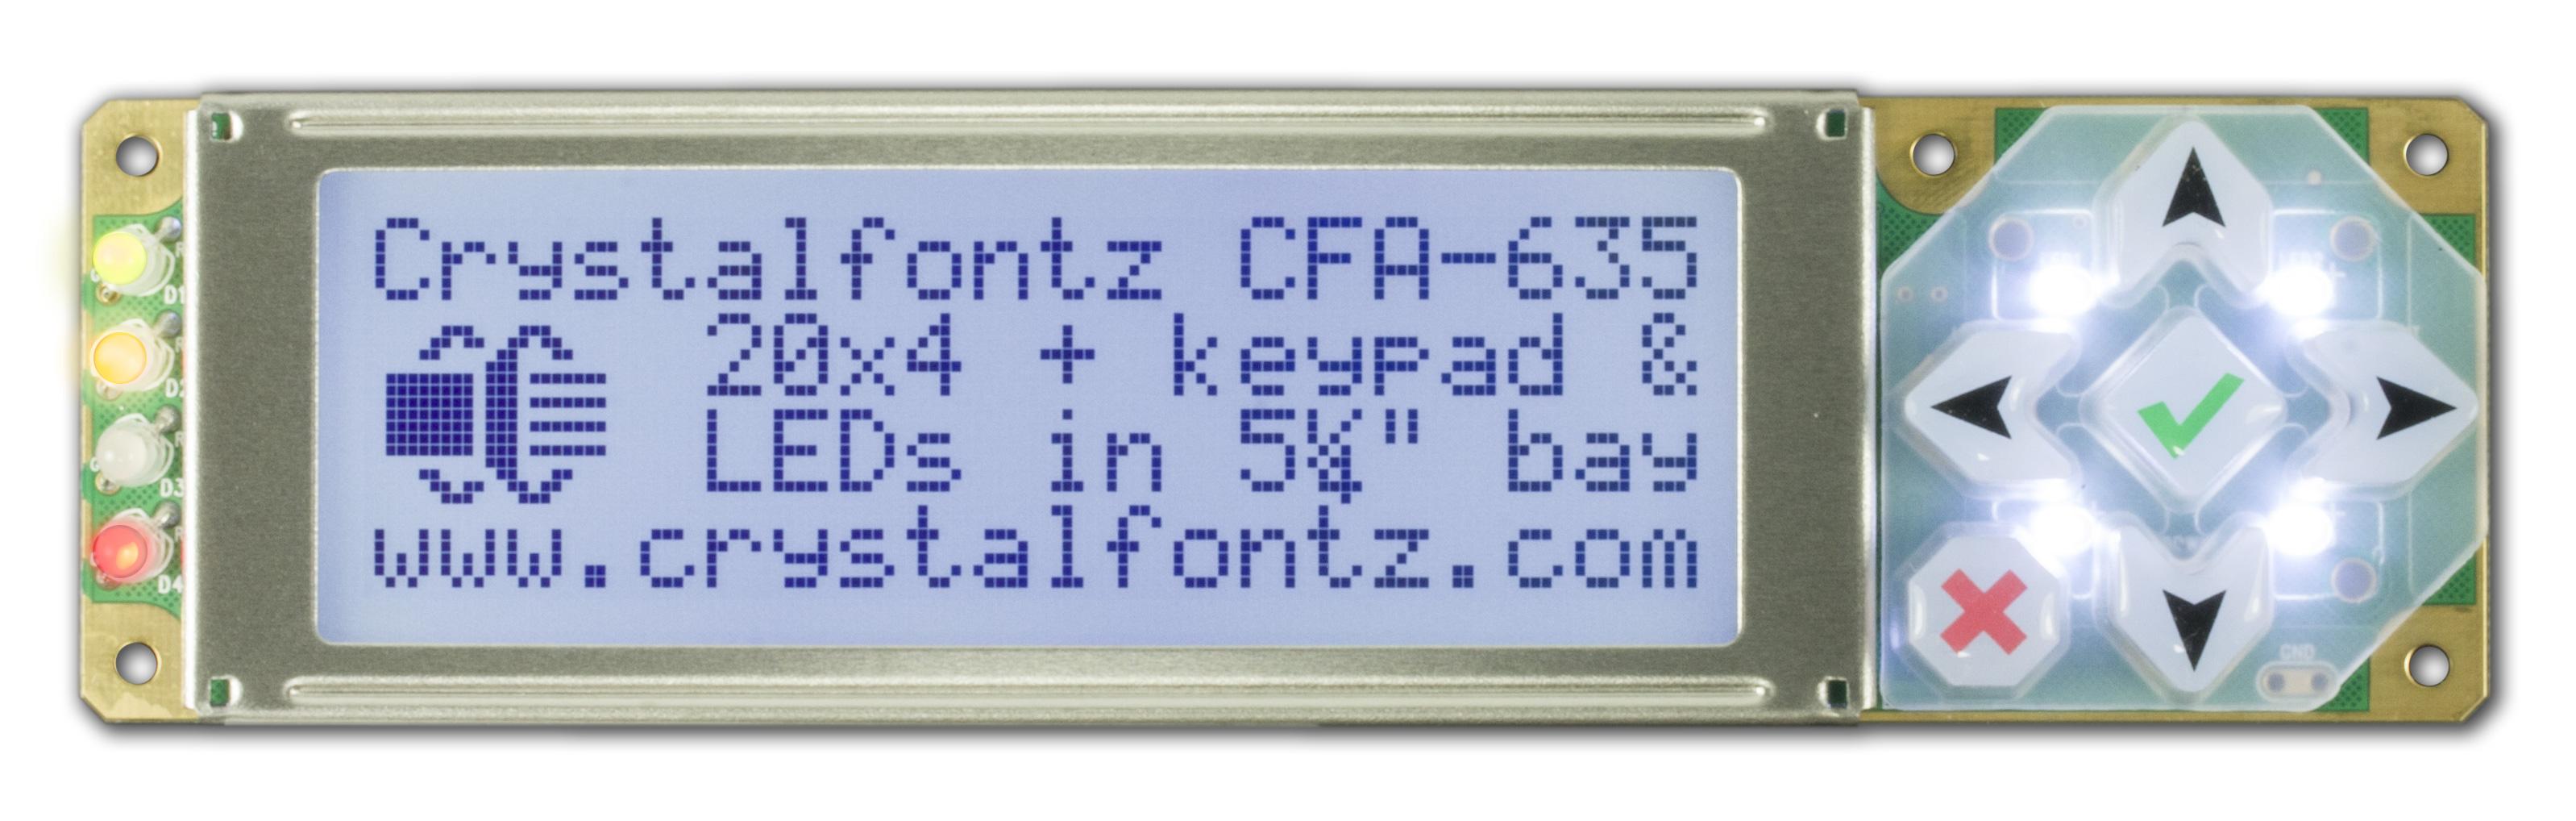 20x4 Rs232 Character Lcd Cfa635tfkks From Crystalfontz Rs 232 Powered Temperature Sensor Cfa635 Tfk Ks